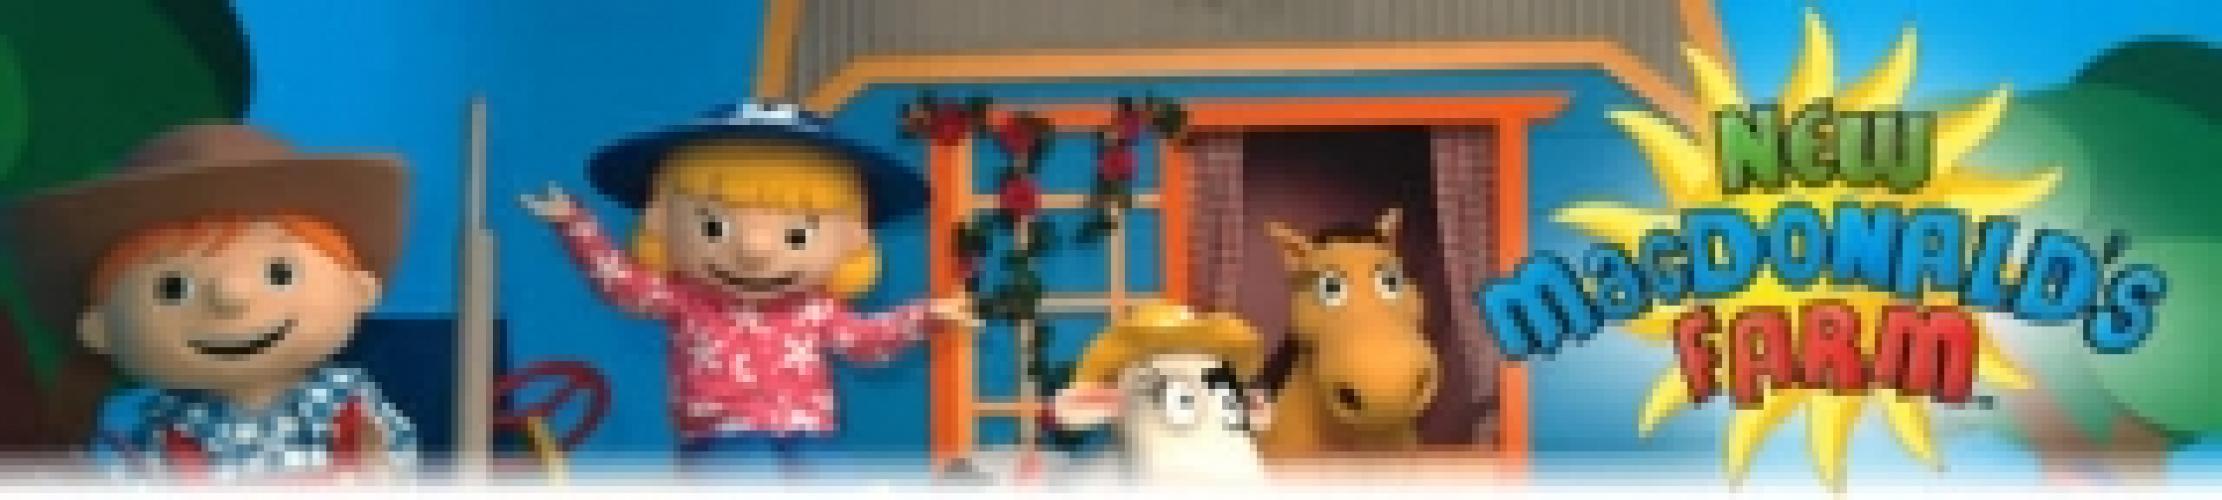 New MacDonald's Farm next episode air date poster